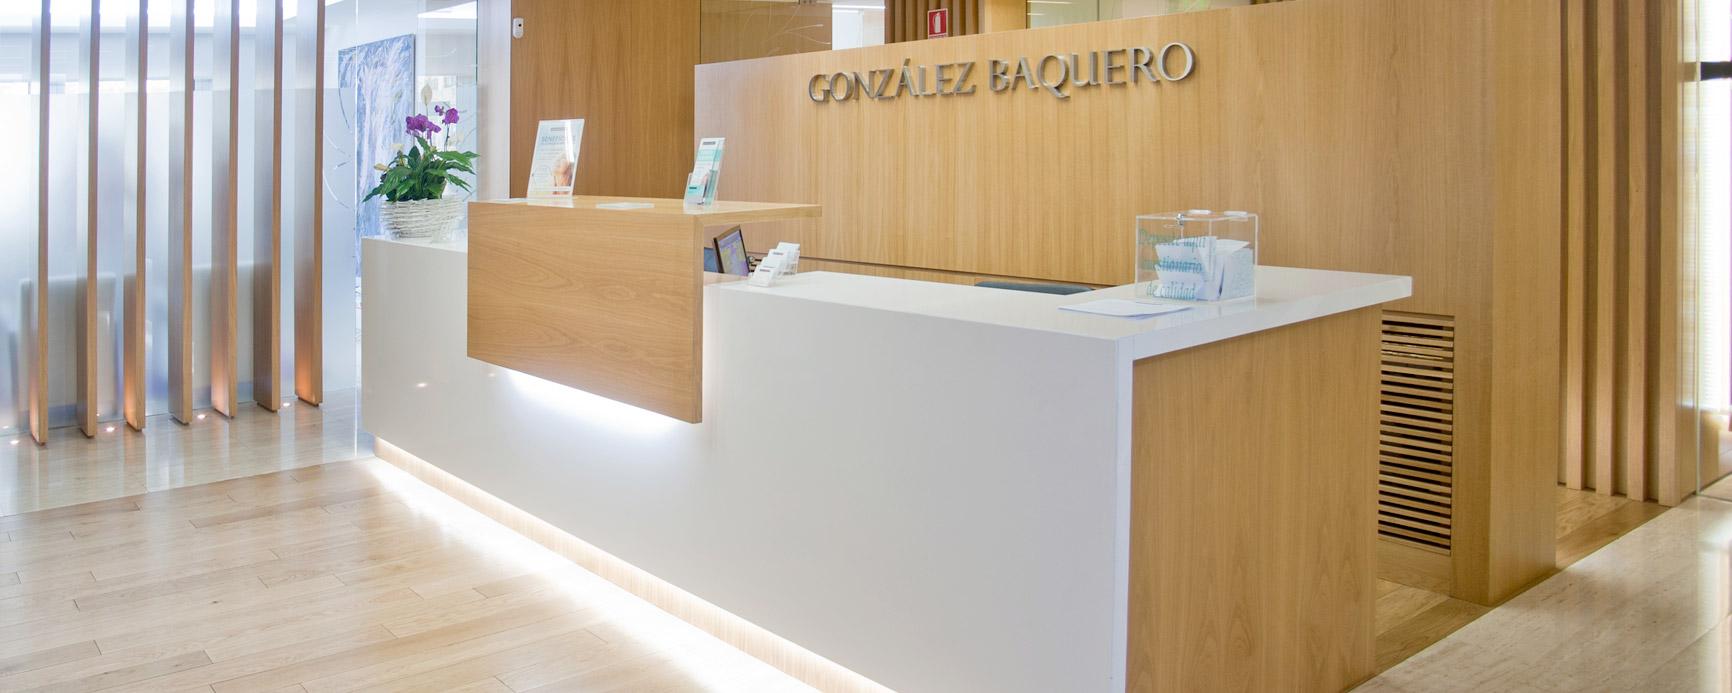 Clínica Dental Gonzalez Baquero